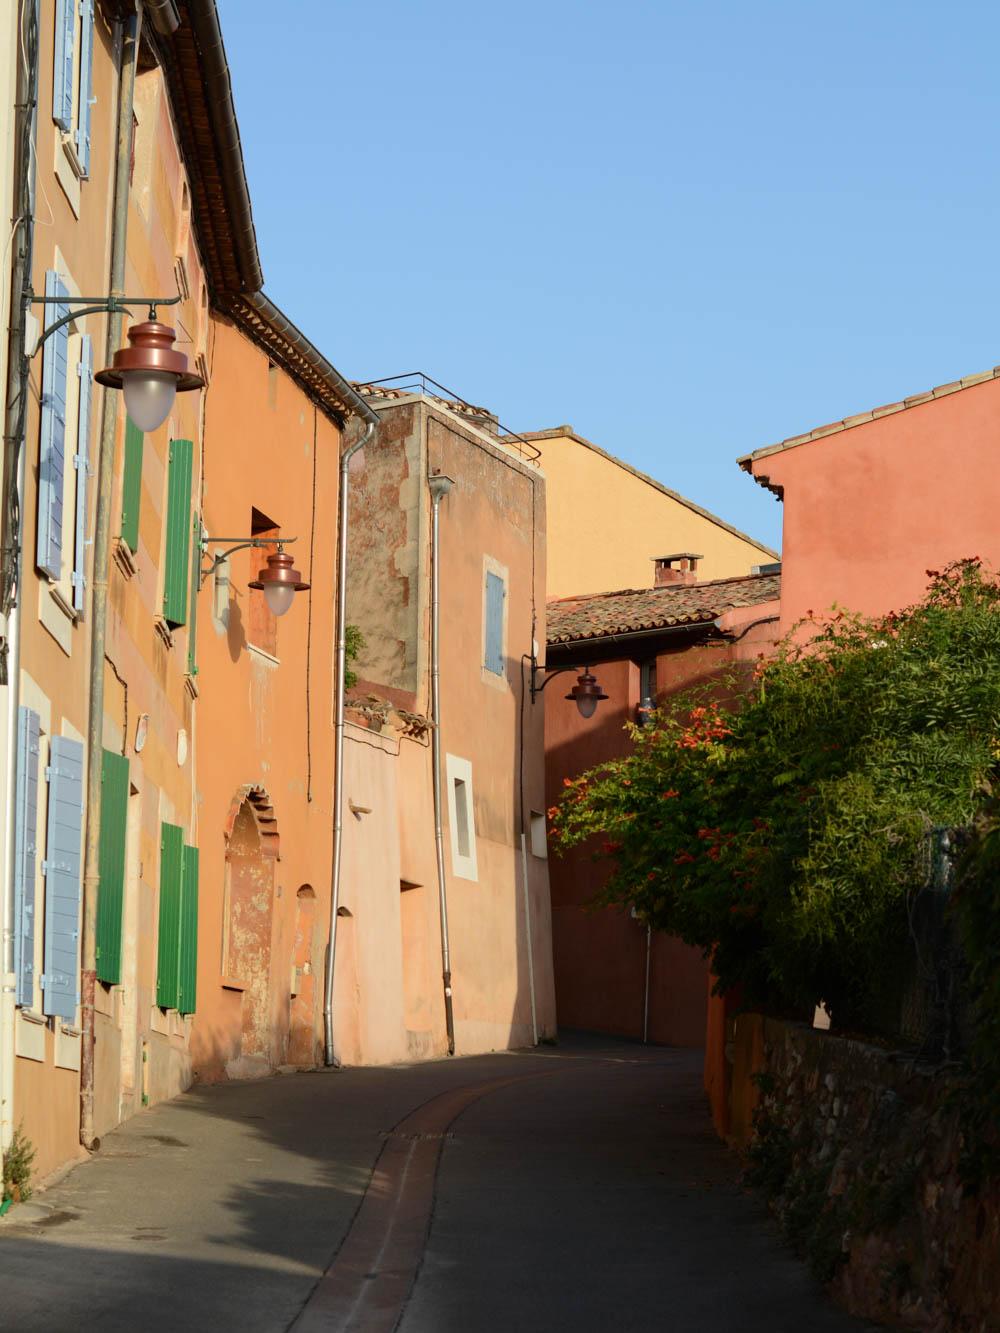 roussillon-provence-france.jpg